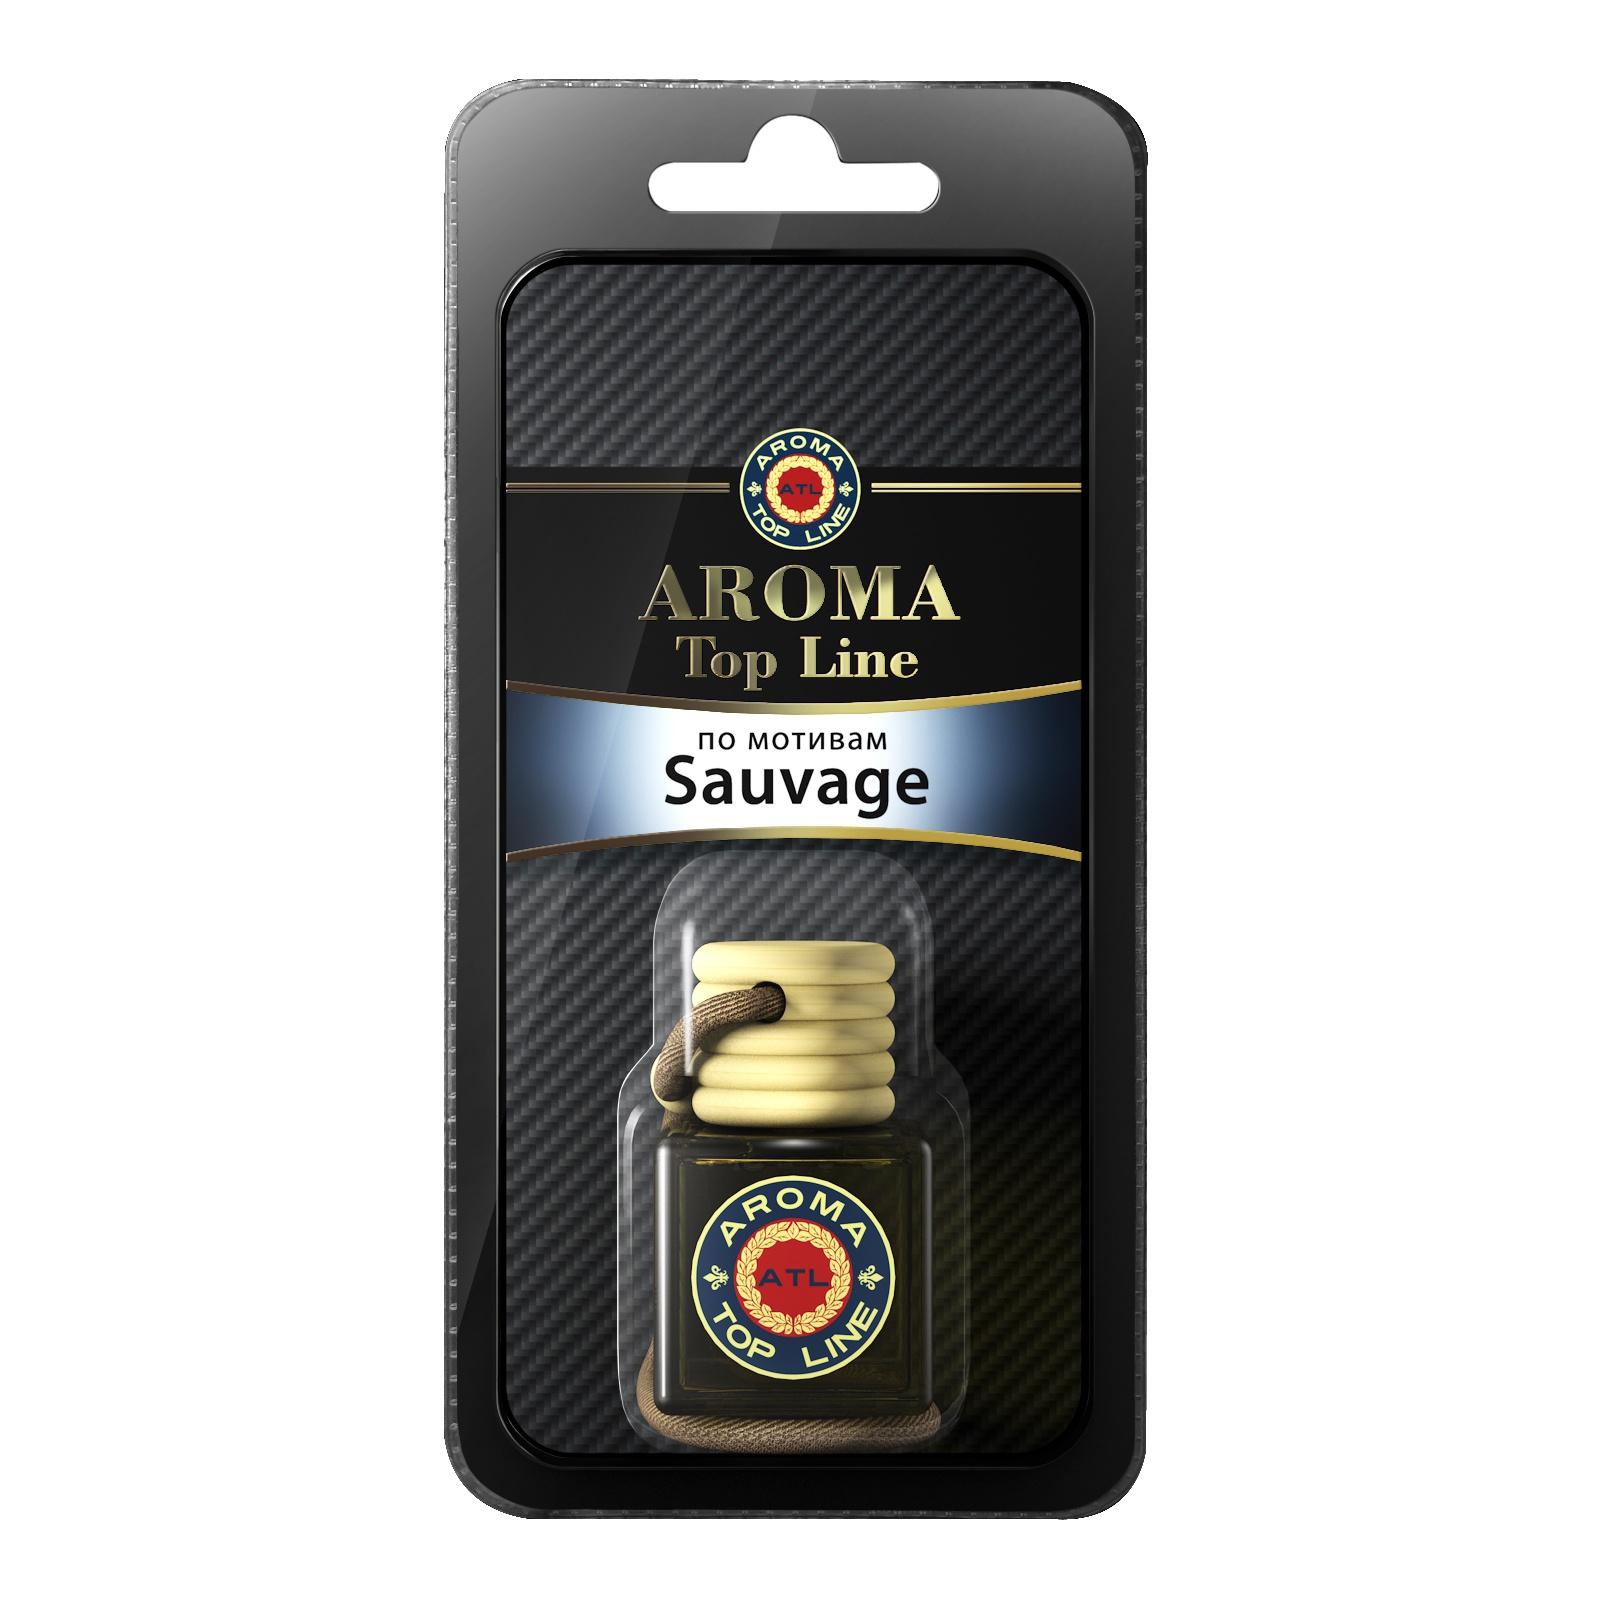 Автомобильный ароматизатор AROMA TOP LINE М17ф 55 Флакон ст. 6ml Savuage автомобильный ароматизатор golden snail aroma football ванильный крем